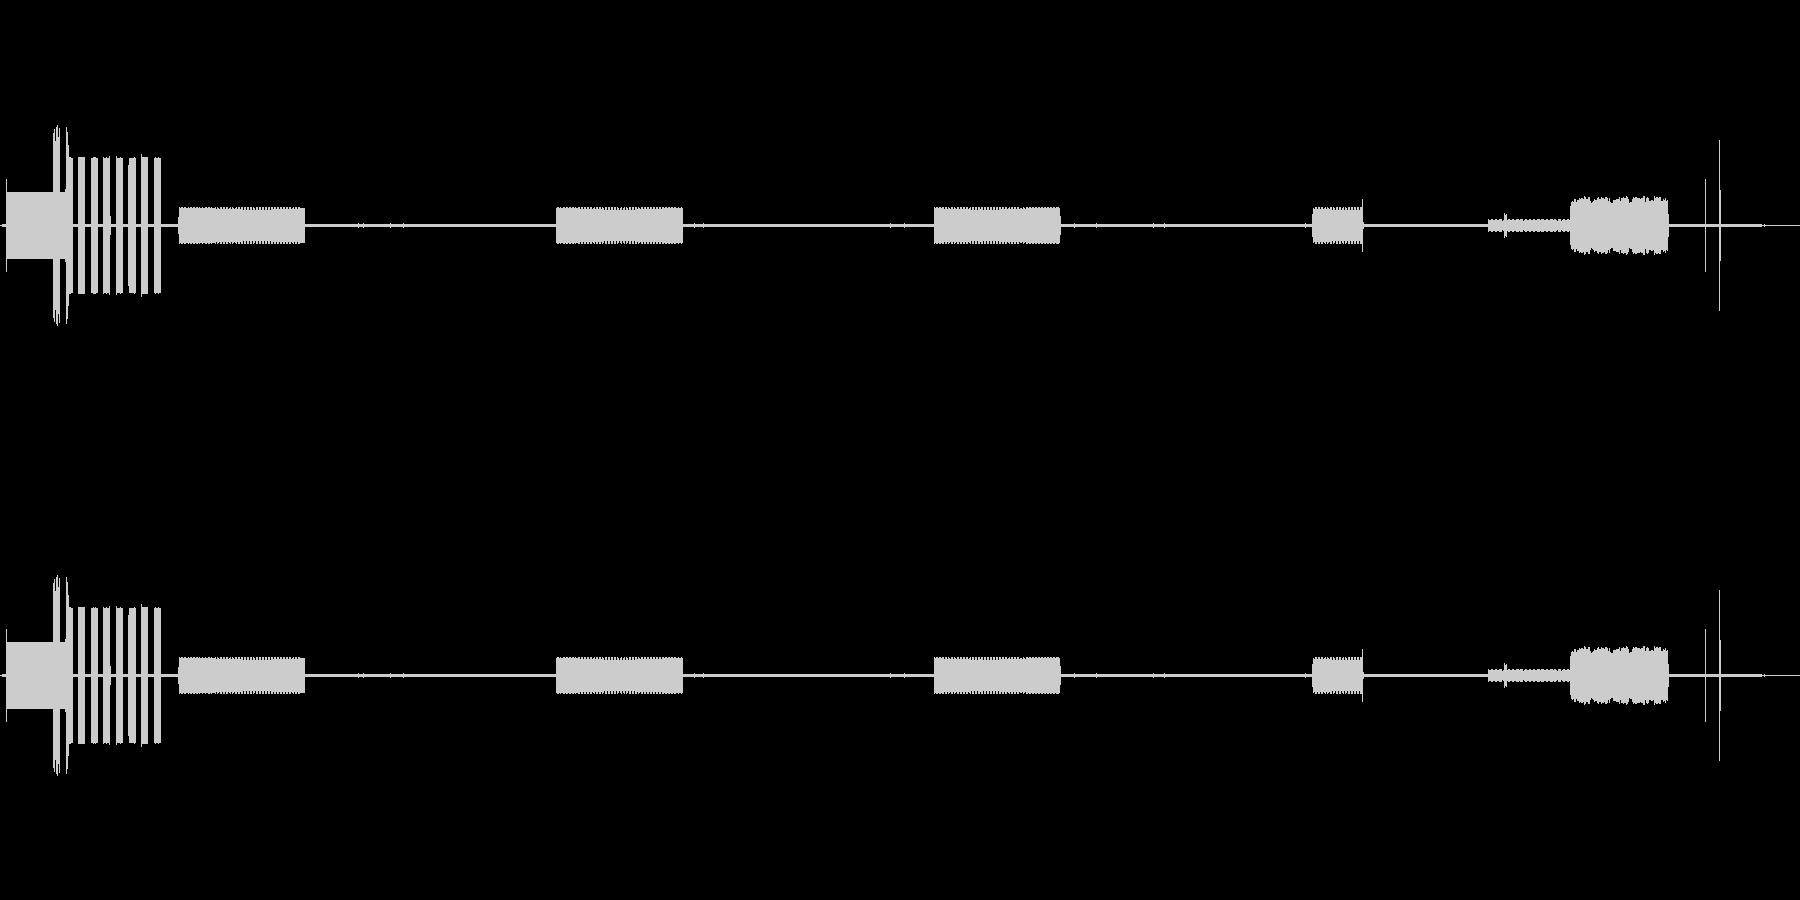 56kダイヤルアップモデムがインタ...の未再生の波形